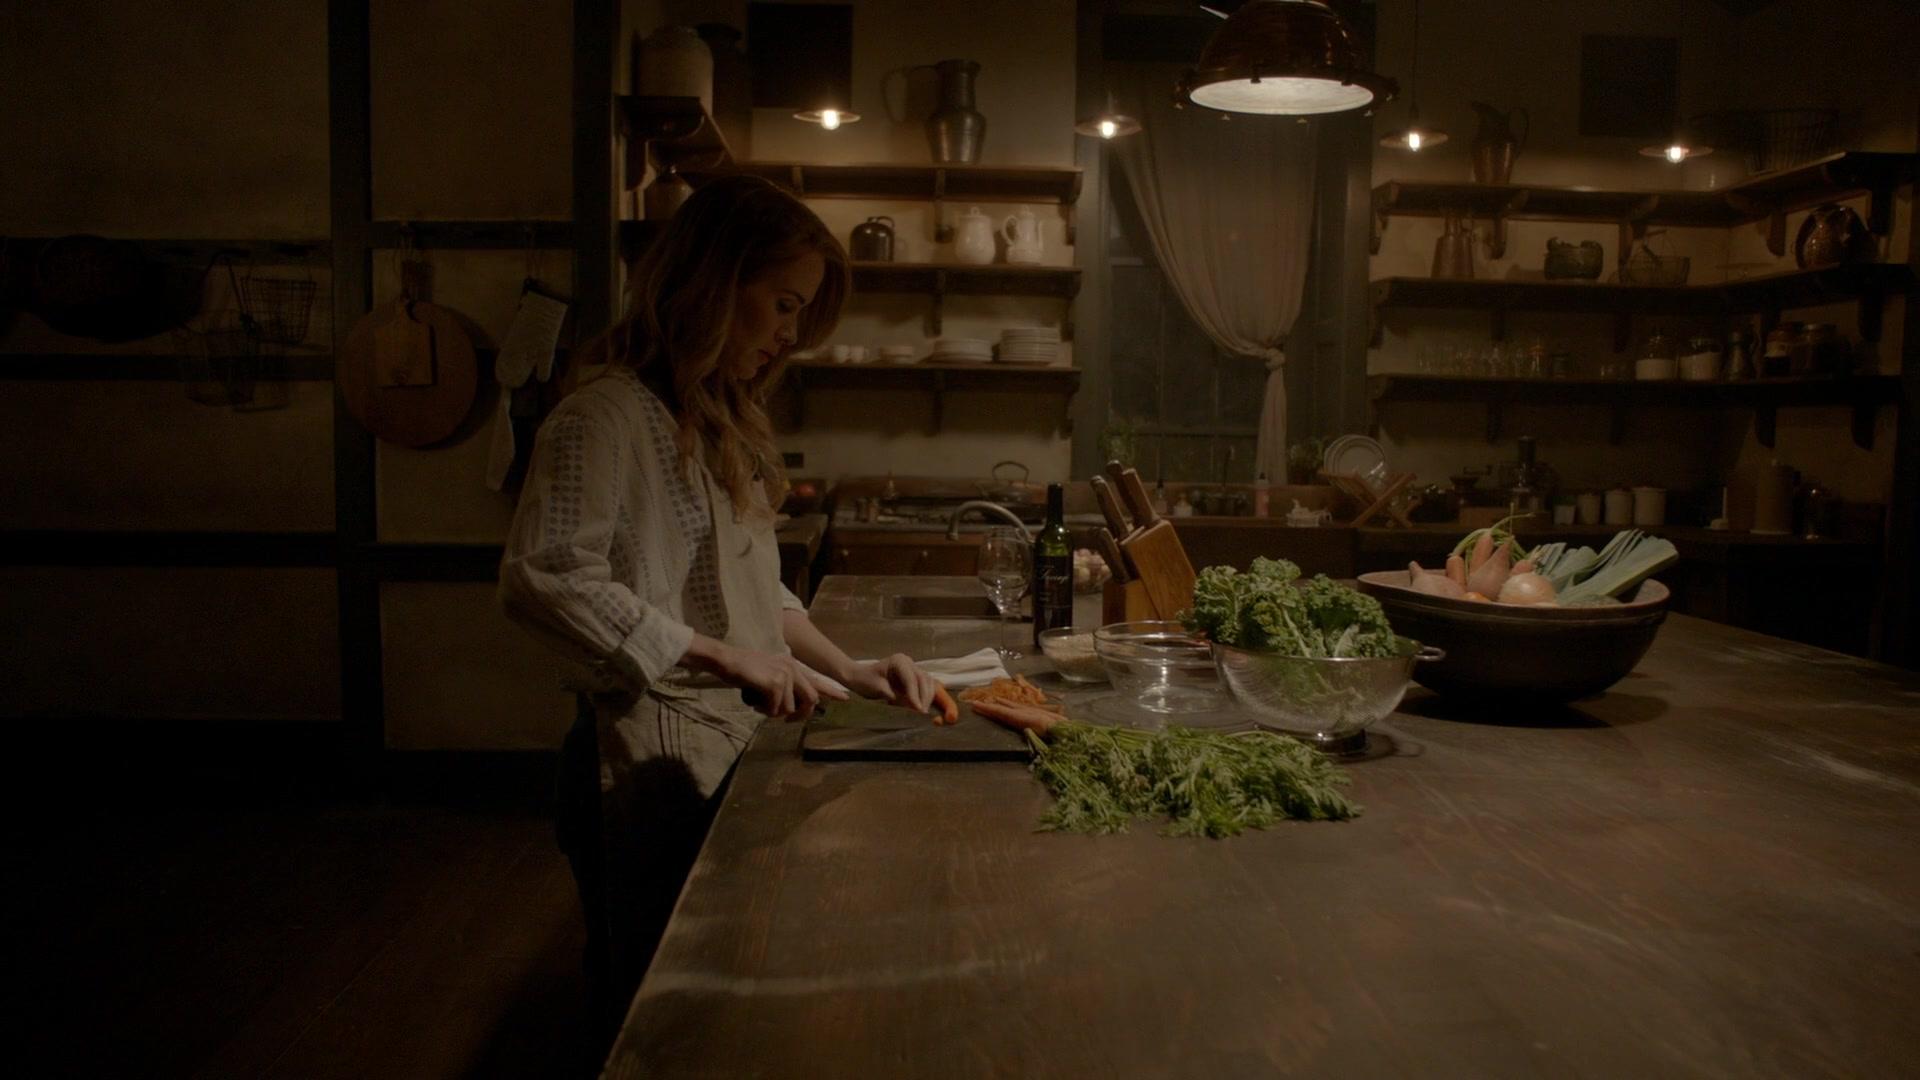 Image Roanoke House Kitchen Jpg American Horror Story